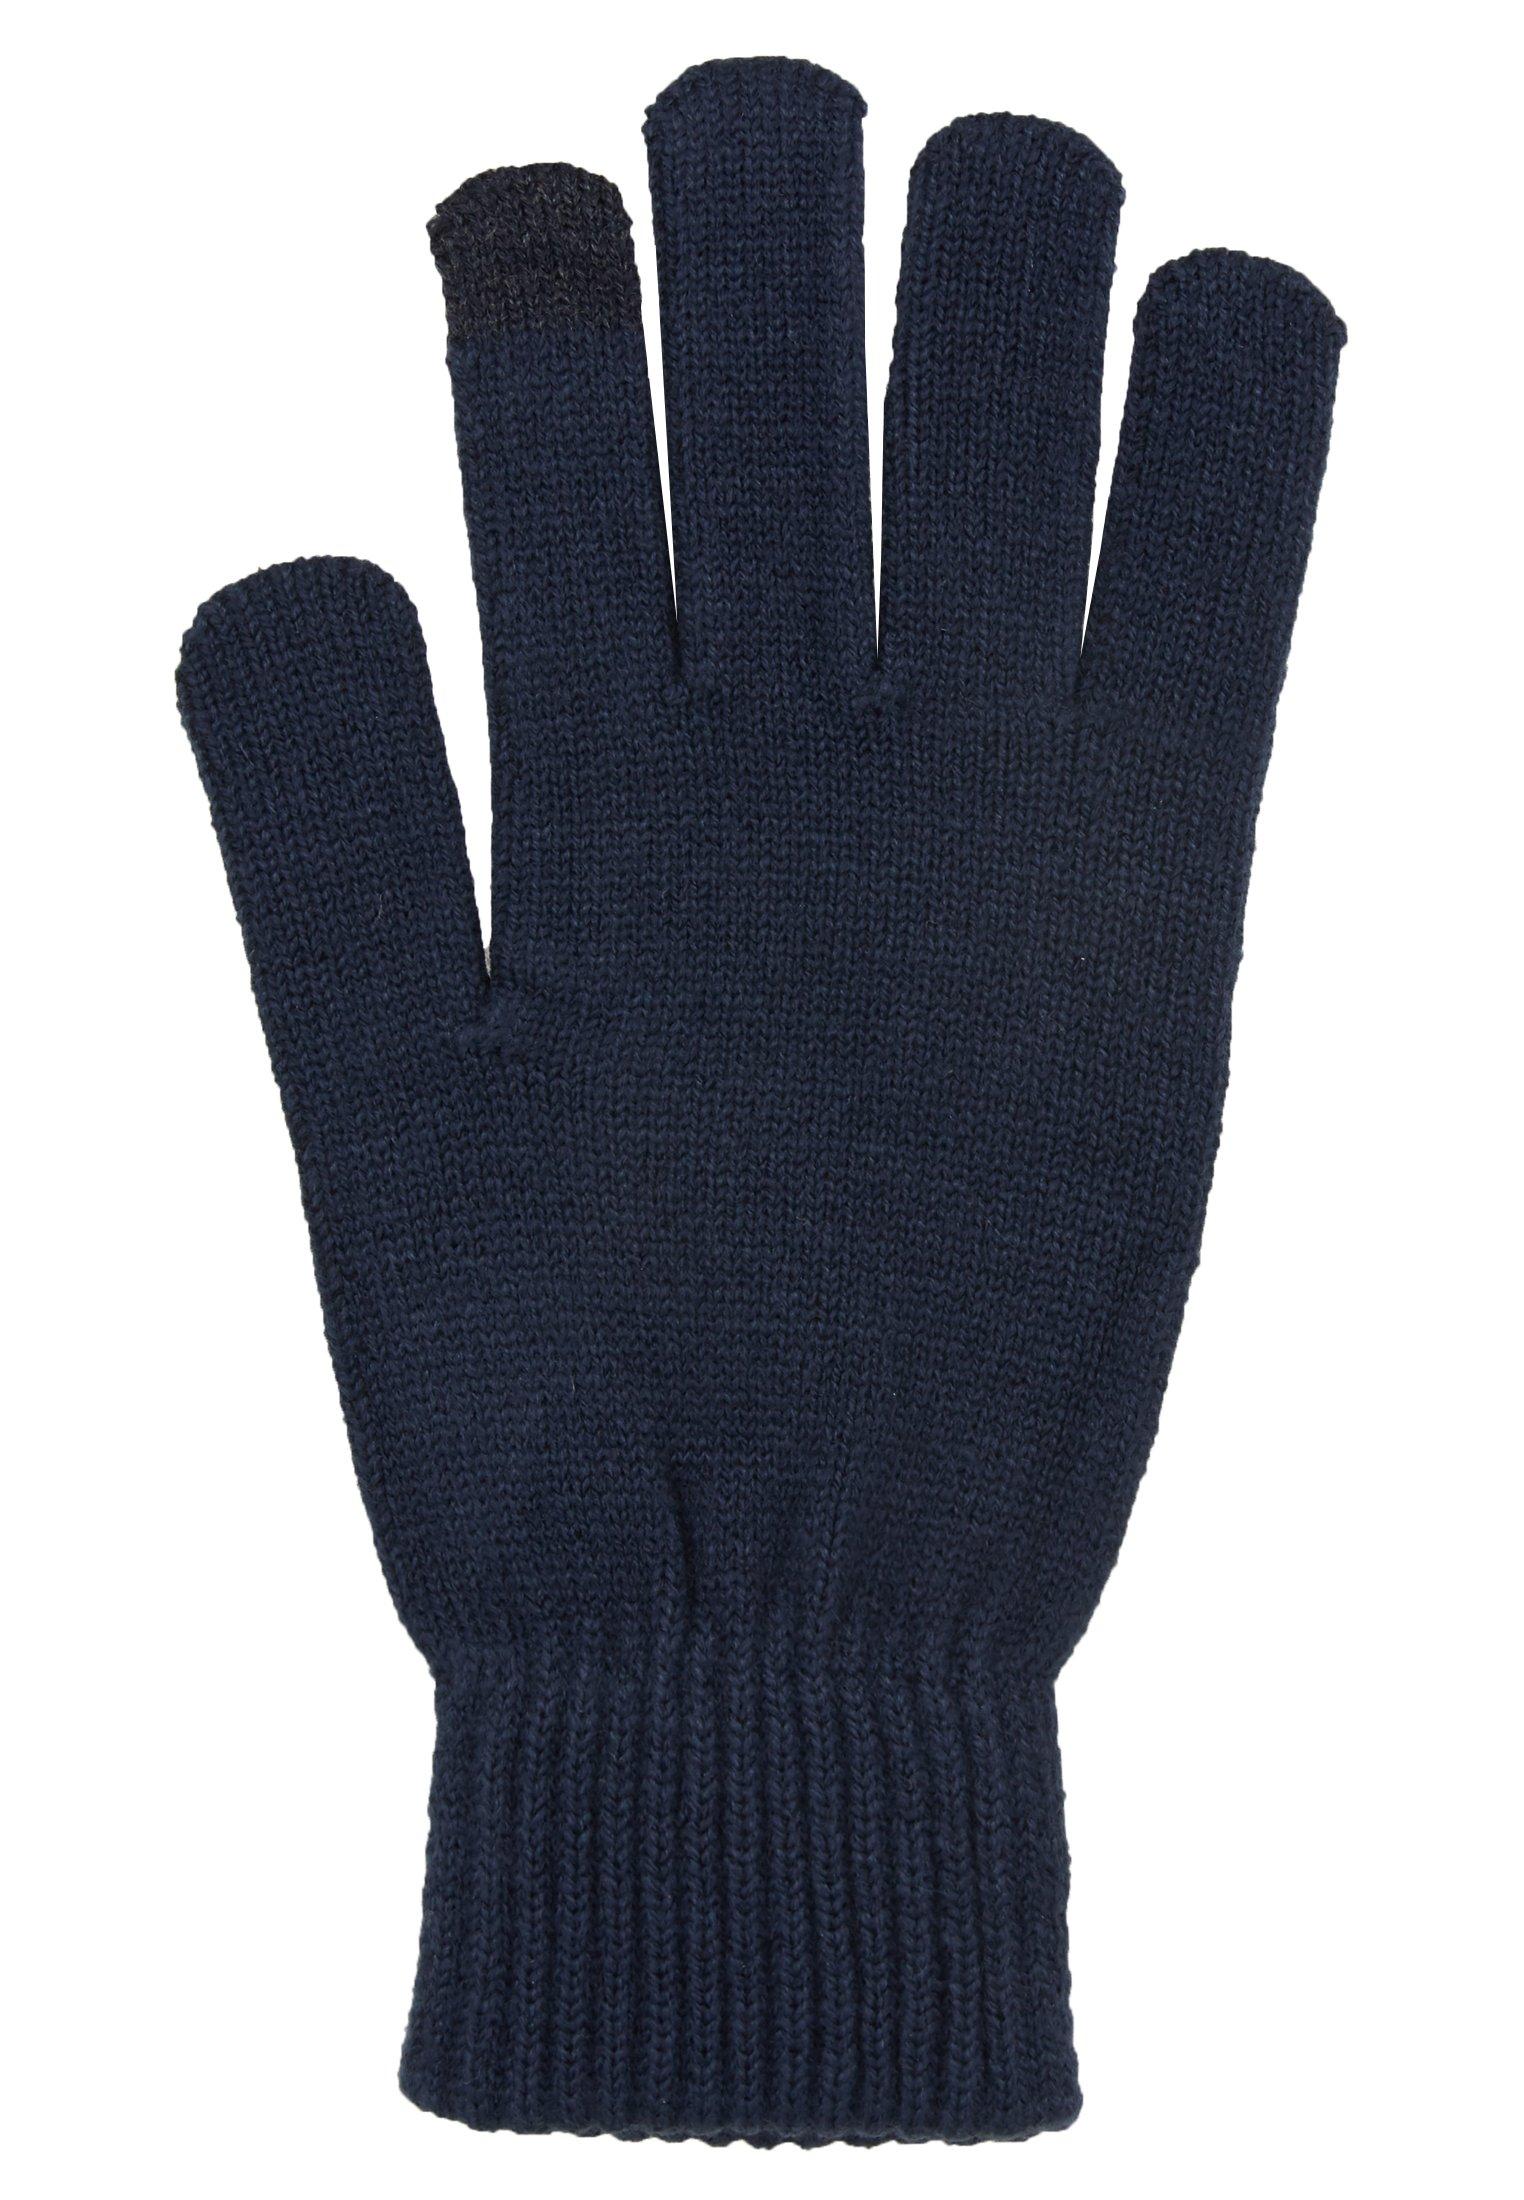 Blazer Navy GlovesGants Jacbarry Jackamp; Jones j54L3AR